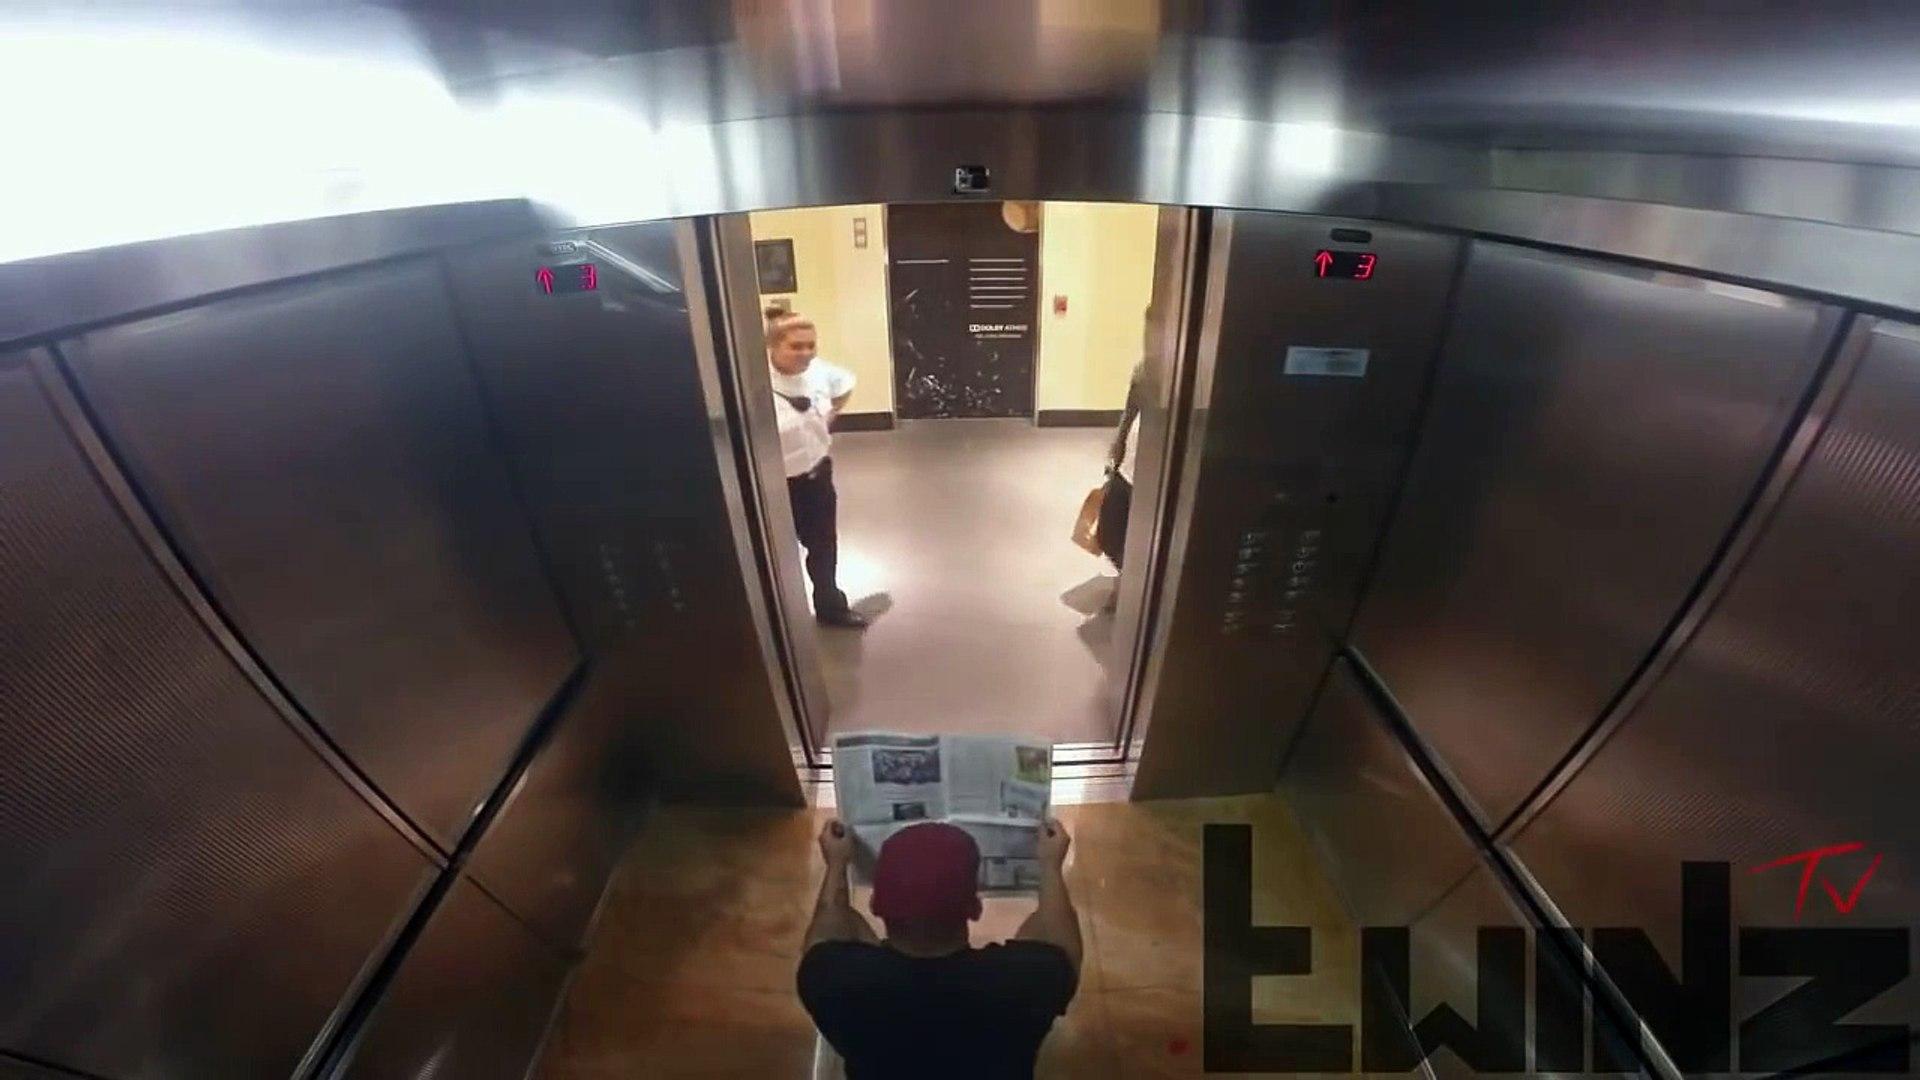 Pooping In The Elevator Top Pranks Pranks In Public Hilarious Elevator Pranks